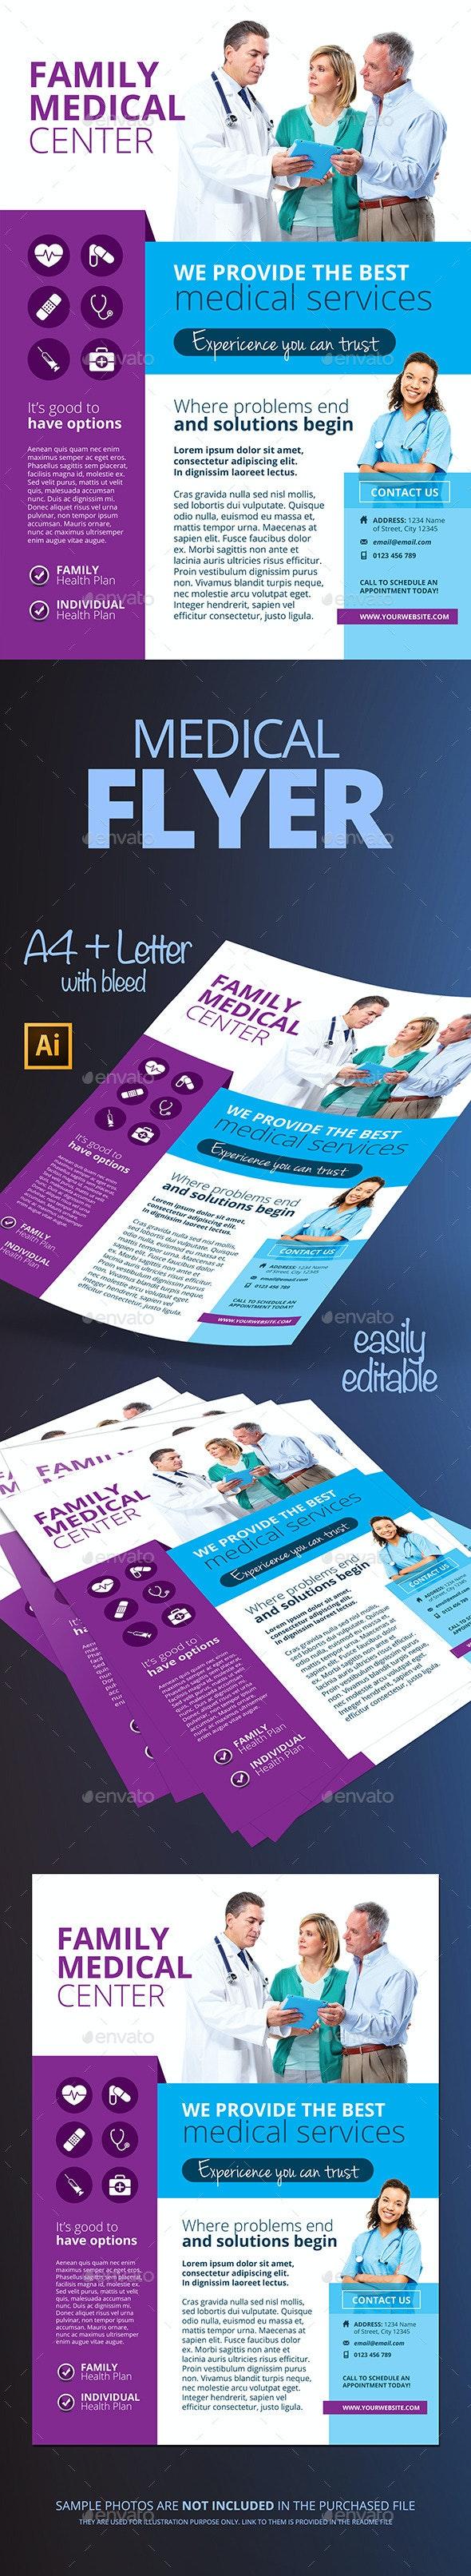 Medical Flyer - Print Templates